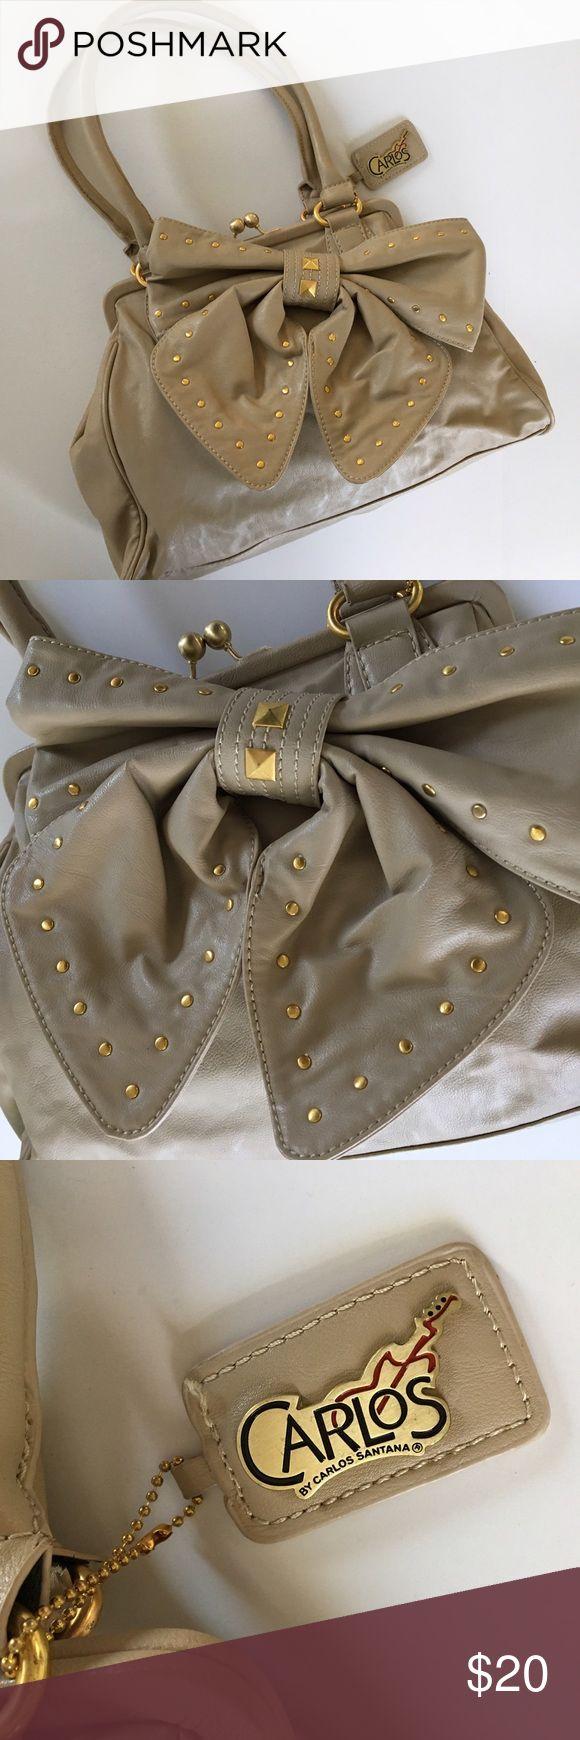 Studded Bow Carlos Santana Handbag Carlos by Carlos Santana handbag. Big bow with gold stud detailing. Gold hardware on tan/grey faux leather. Perfect condition. Like new. NEVER WORN. Carlos Santana Bags Shoulder Bags